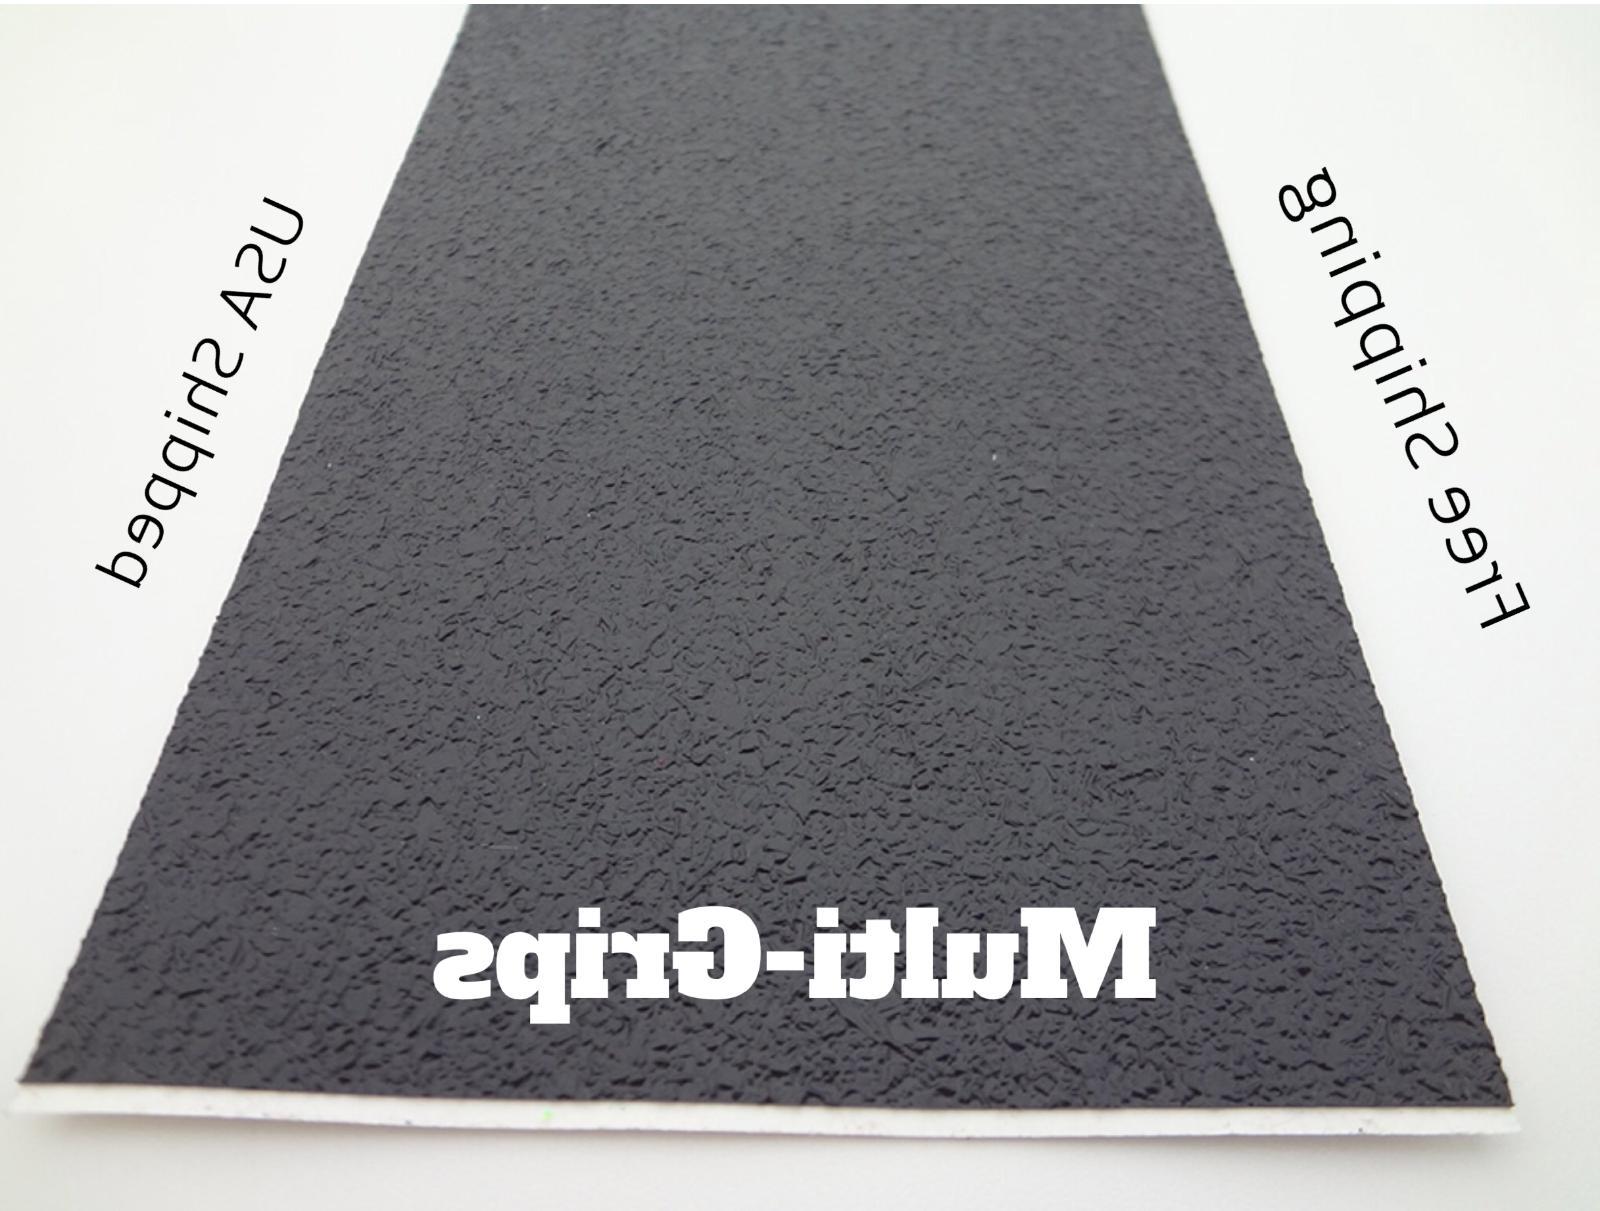 multi grips gun grip tape material rubber